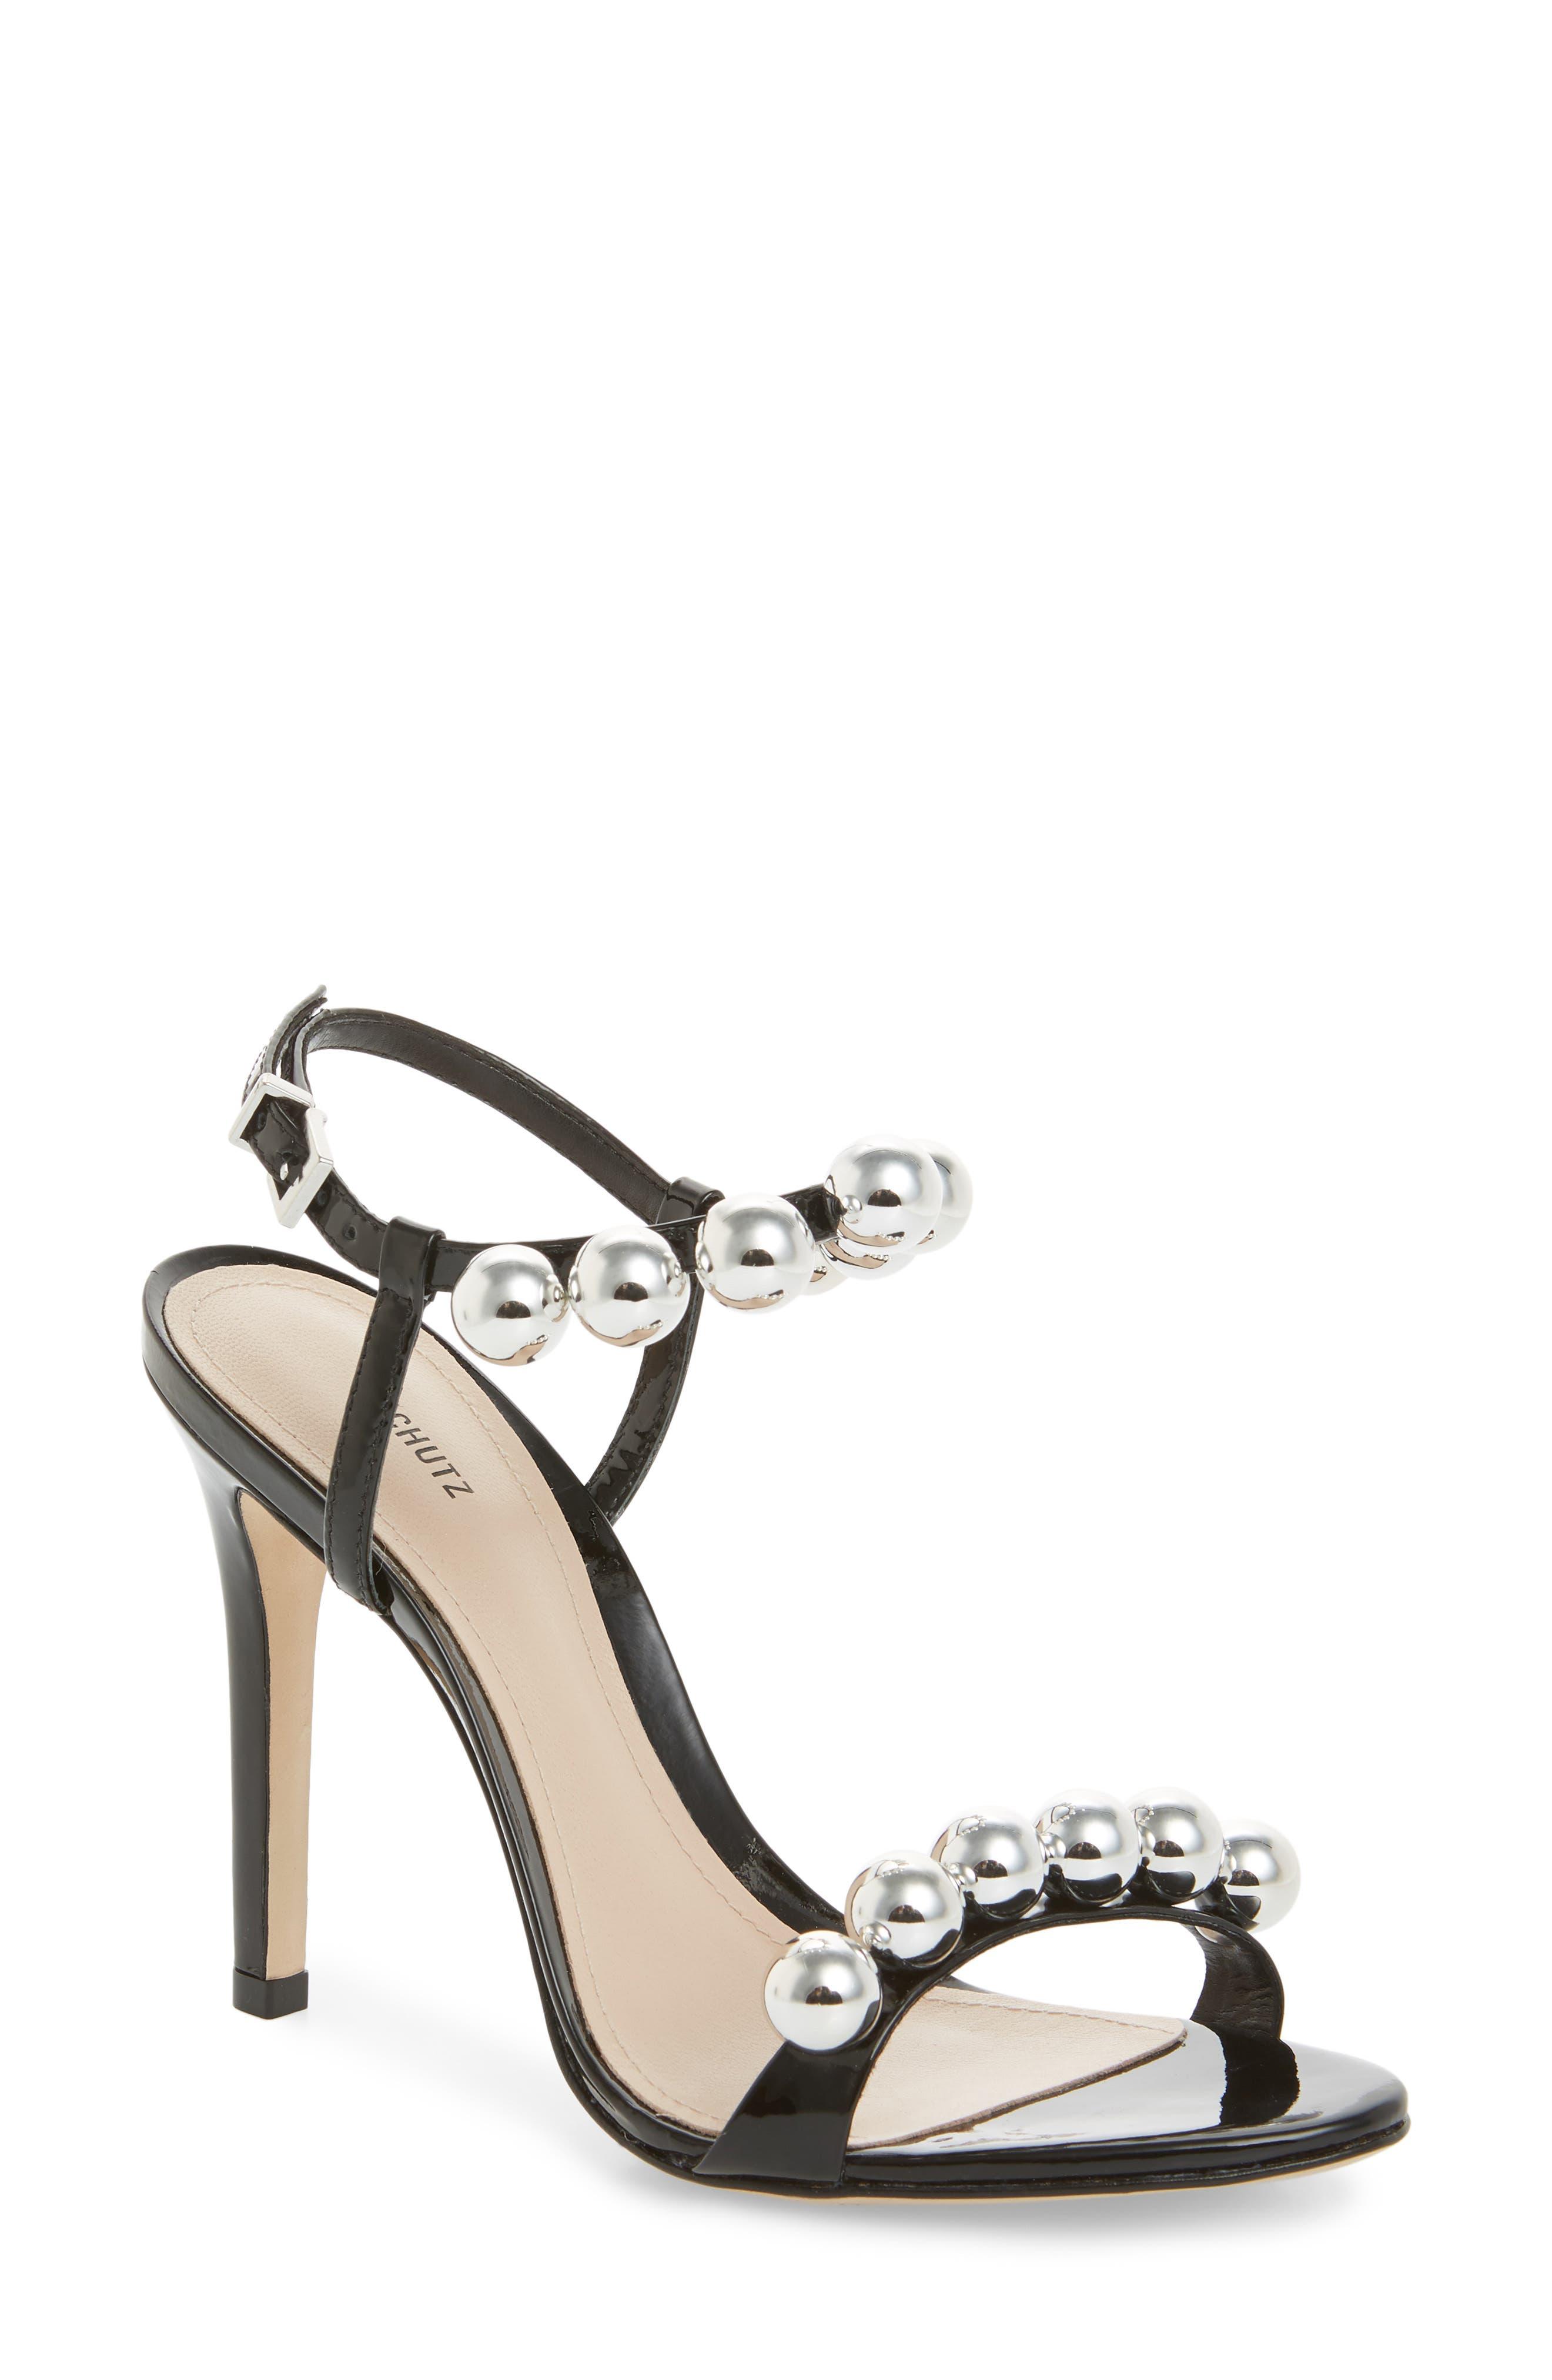 Nellie Sandal, Black Leather